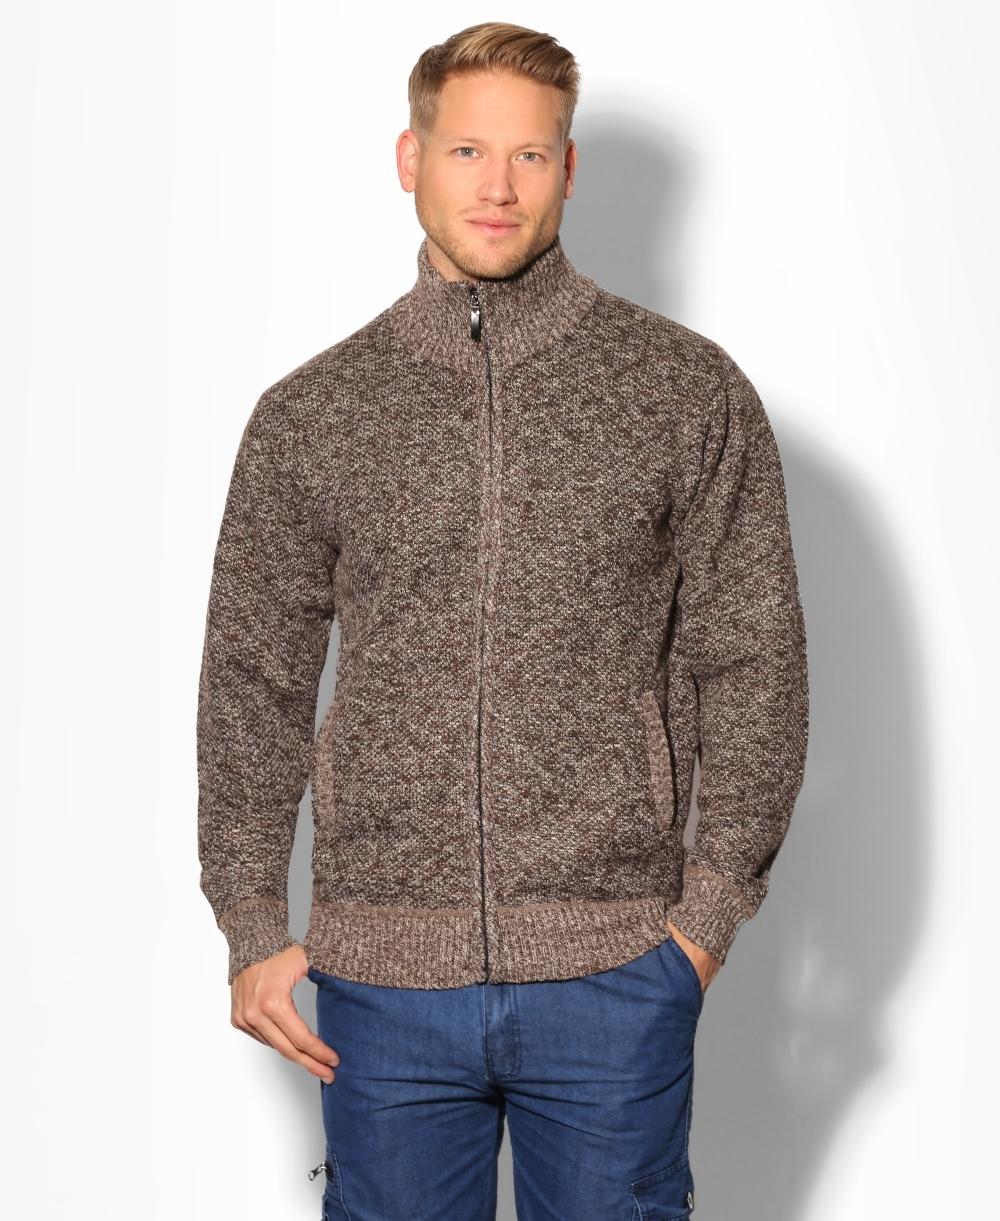 Mens Knitwear | Chunky Knit Zipped Cardigan | Krisp Mens